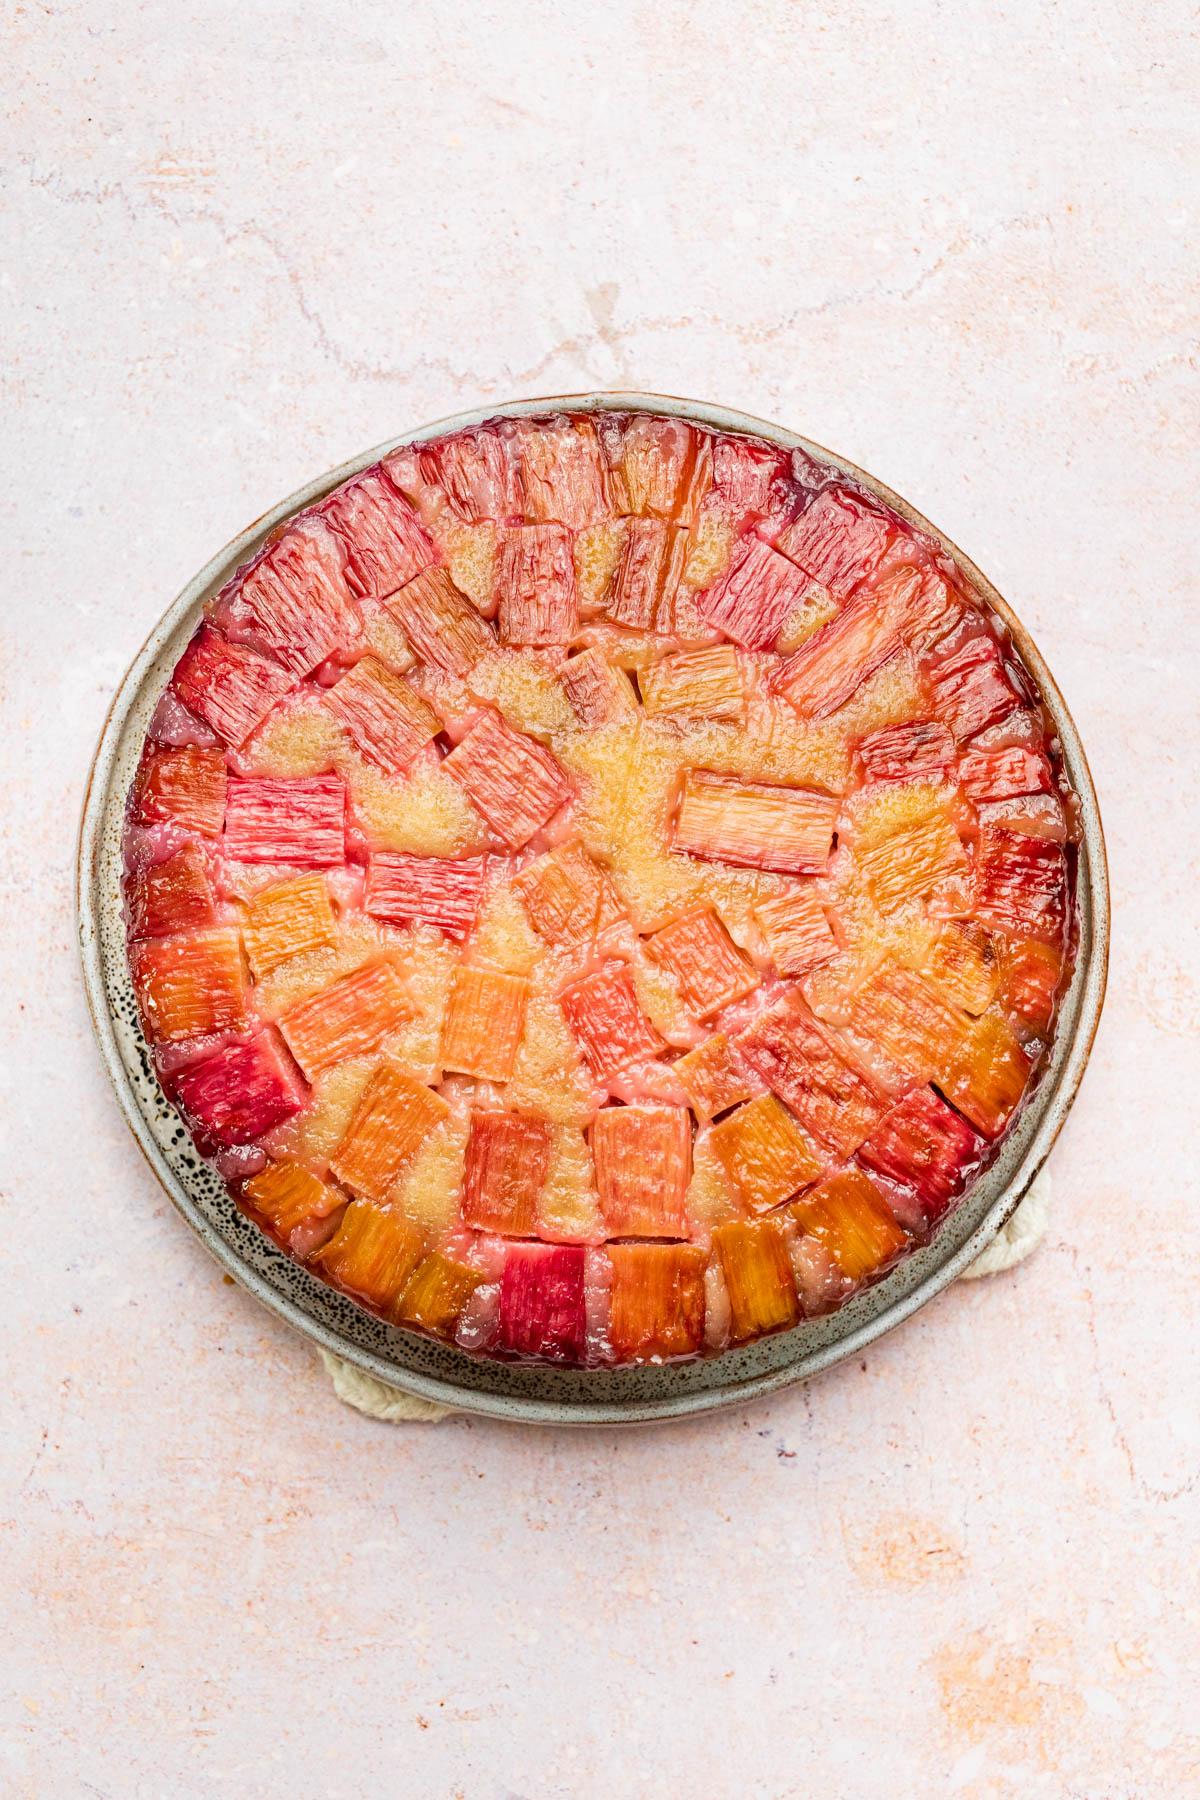 Flipped cake to show the rhubarb base.